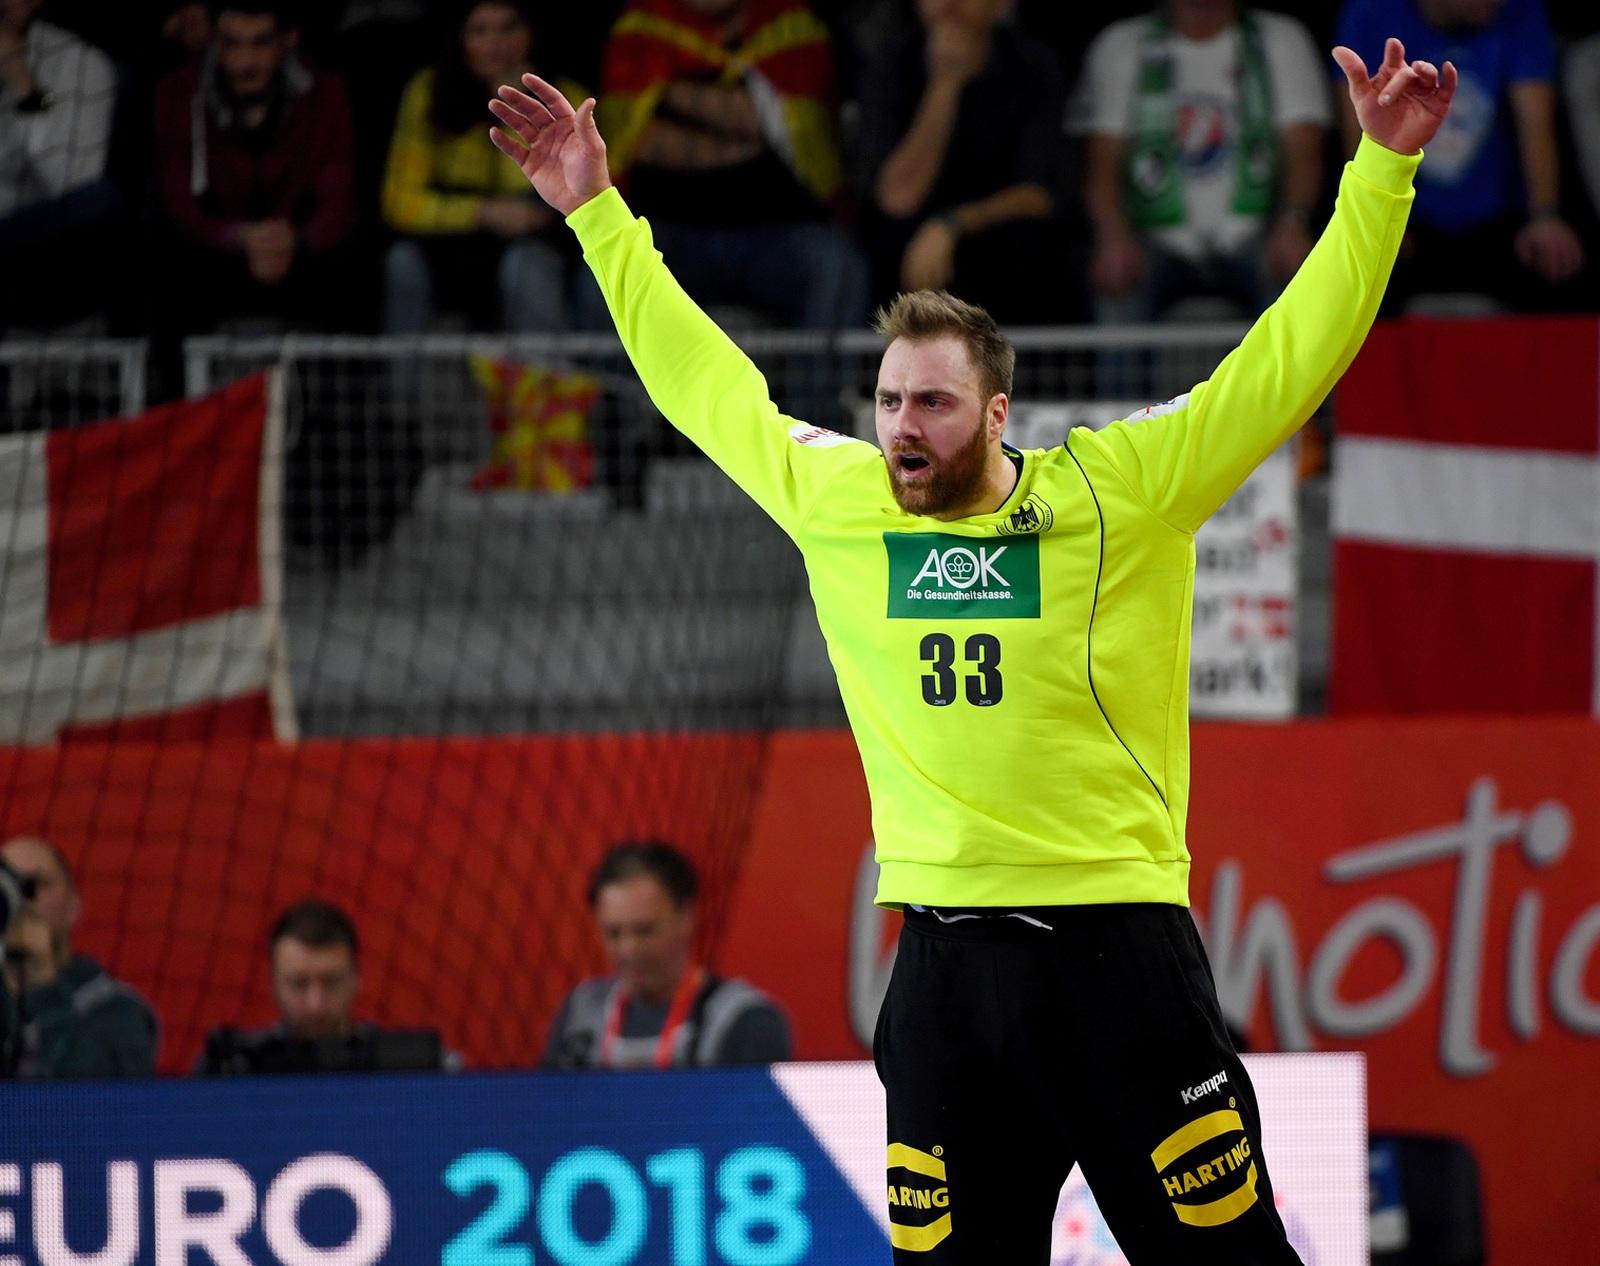 handball-deutschland.de